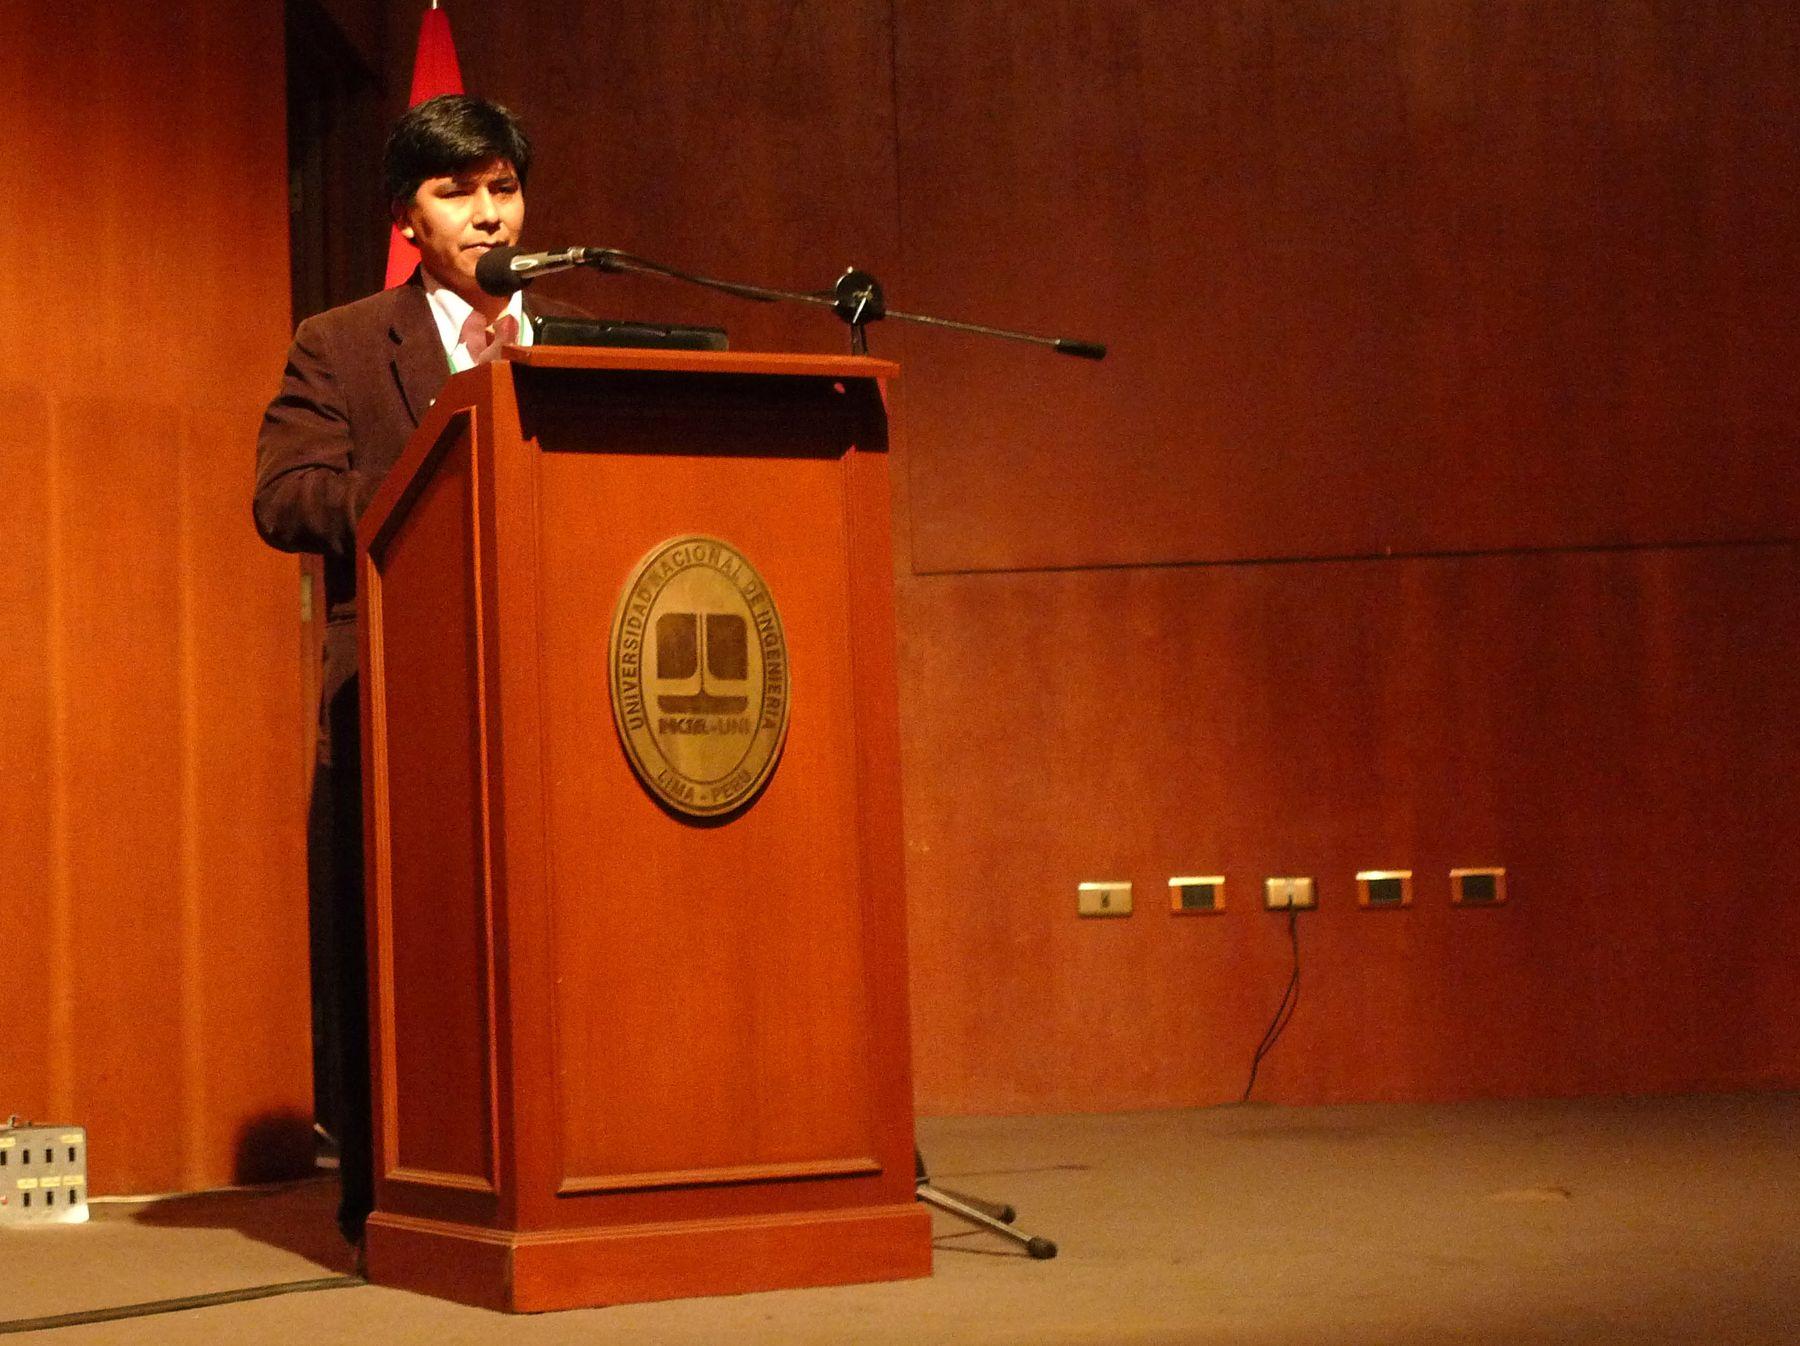 Mario Carhuapoma expone en Encuentro Científico Internacional. Foto: ANDINA/Josimar Cóndor.